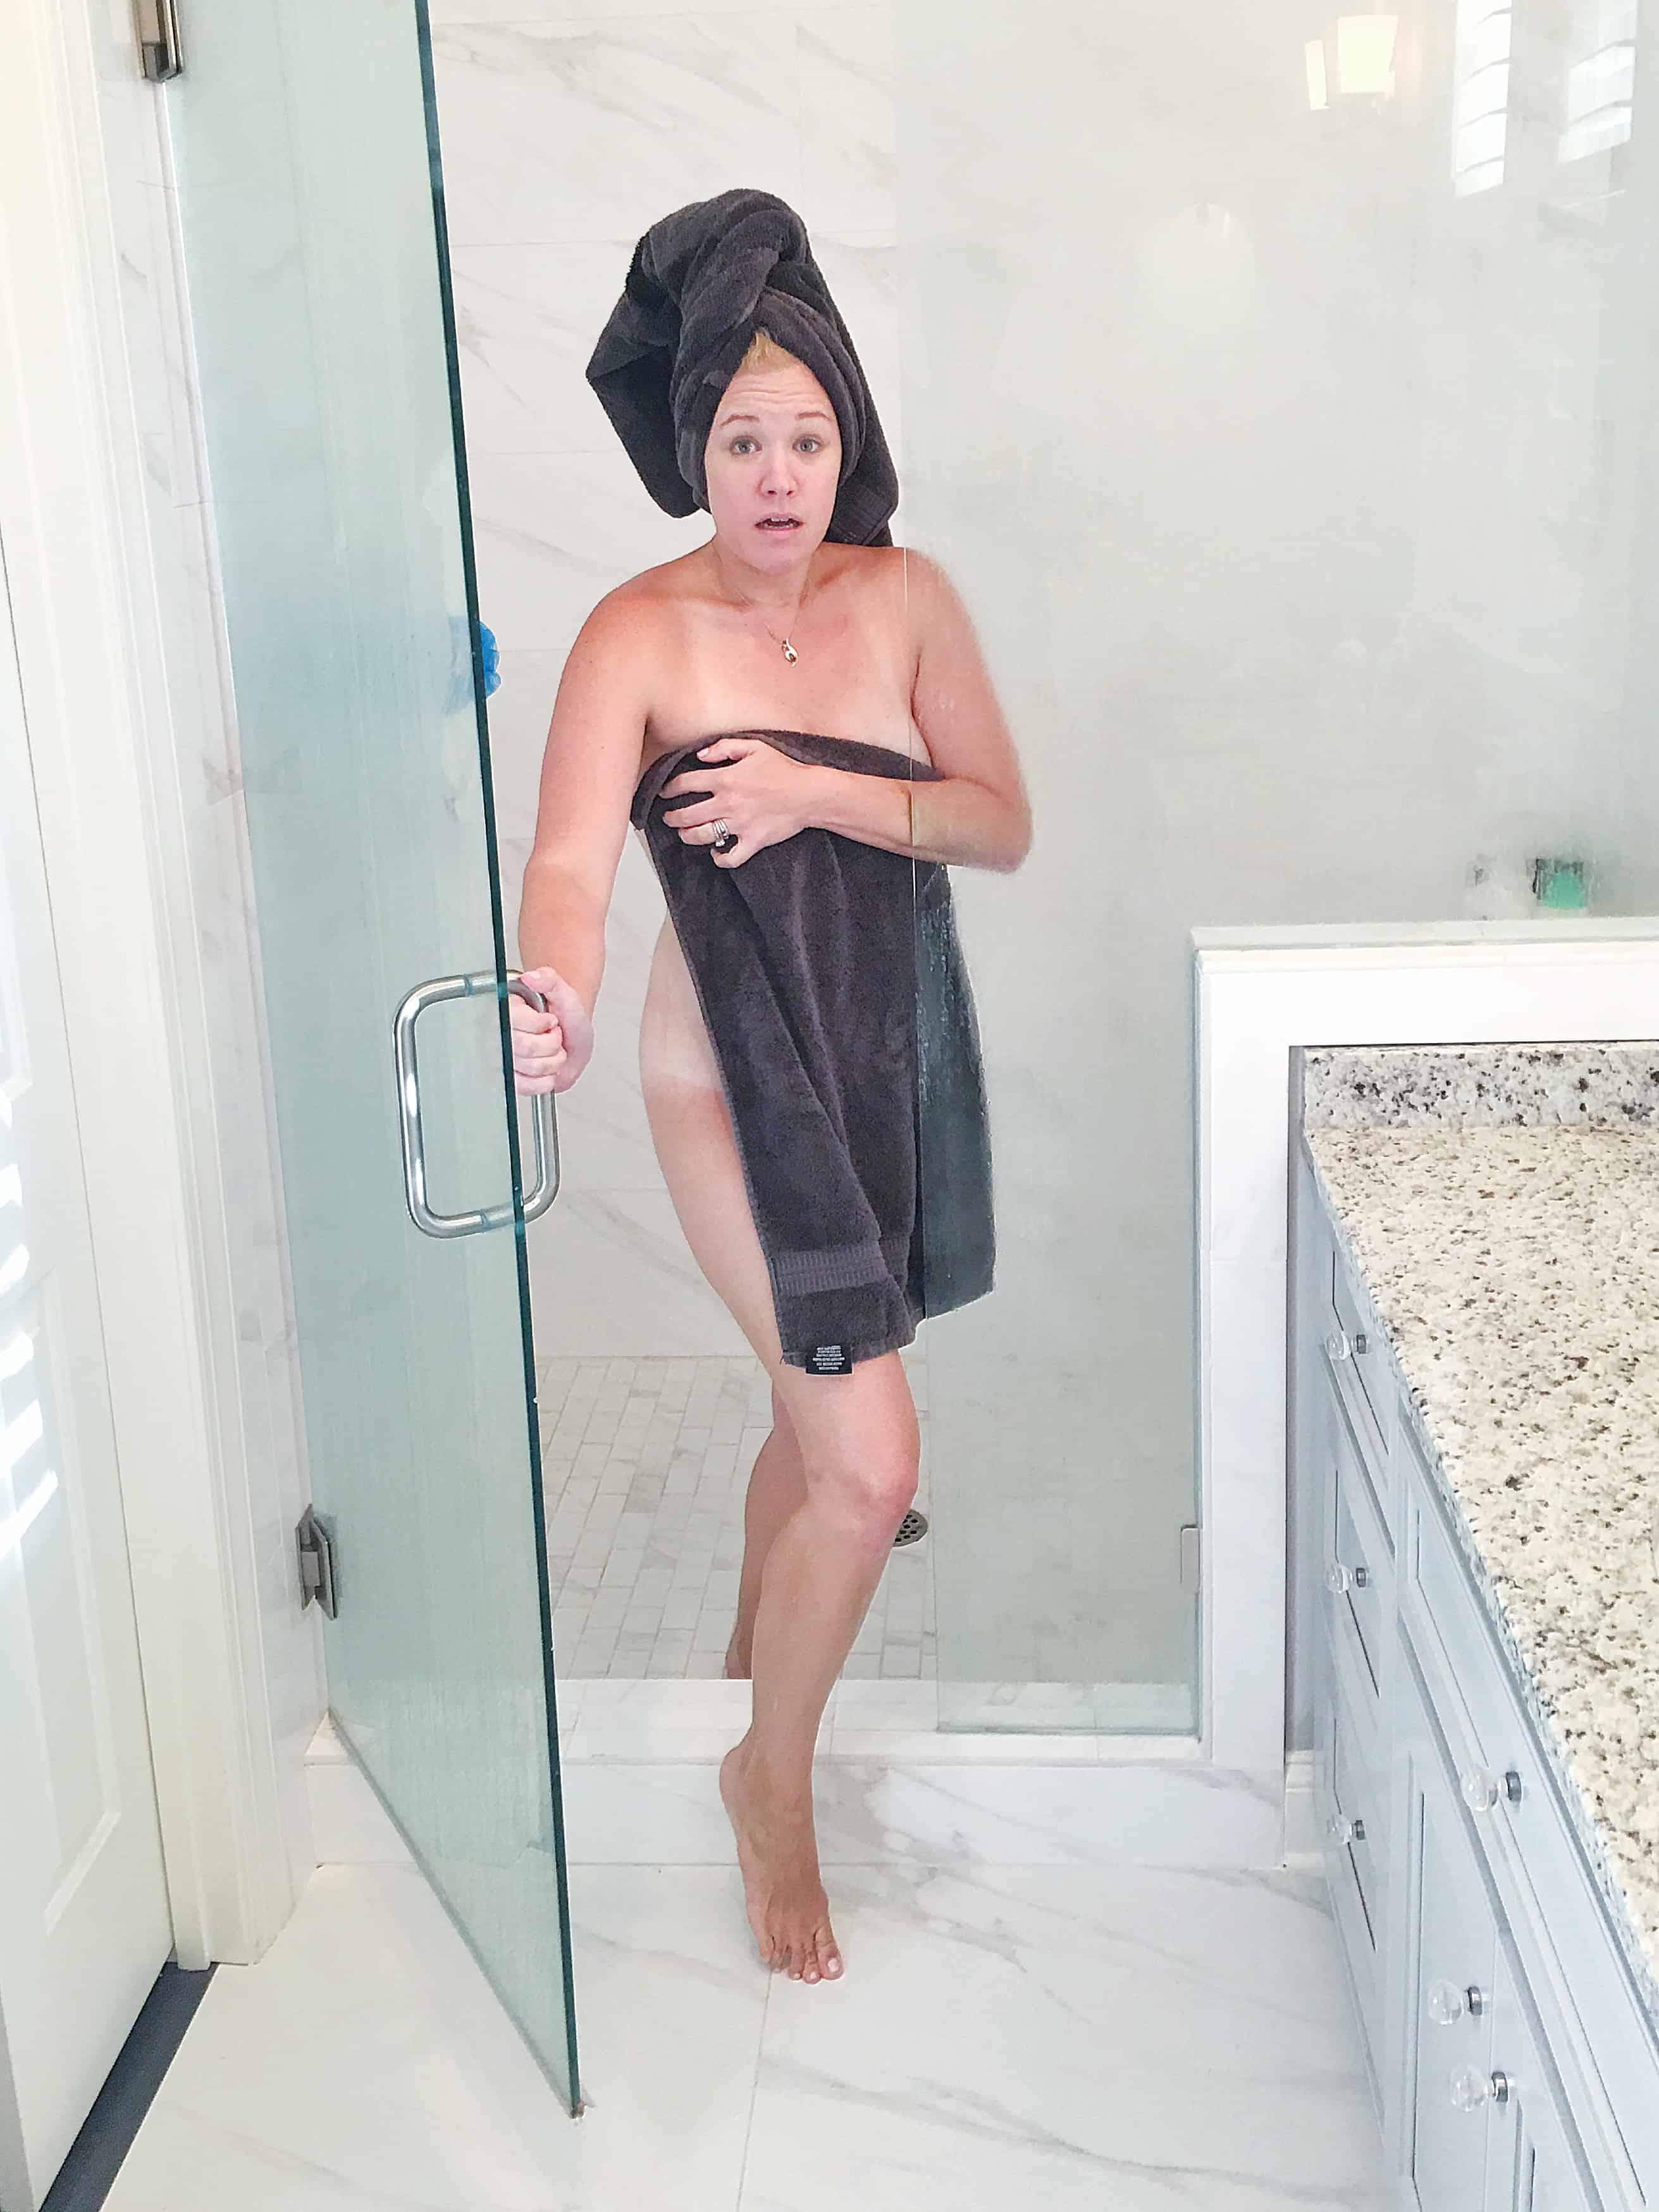 Husband took naked photos of me